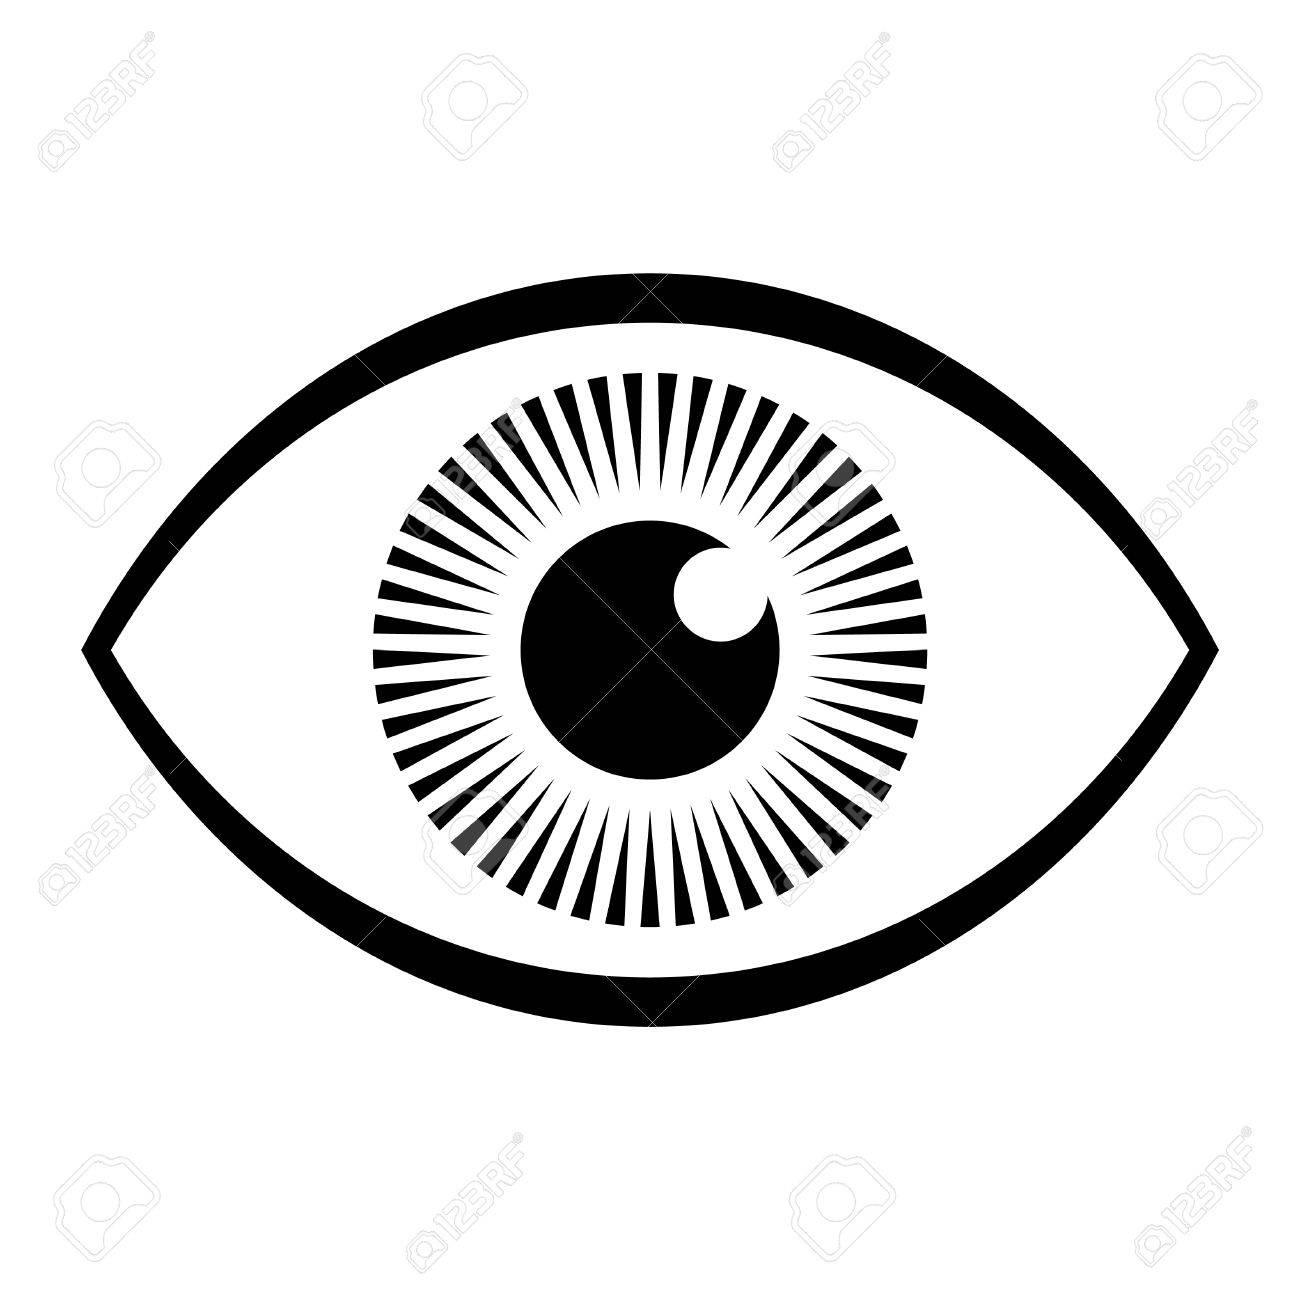 eye vector icon royalty free cliparts vectors and stock rh 123rf com vector eyeball inkscape eyeball vector art